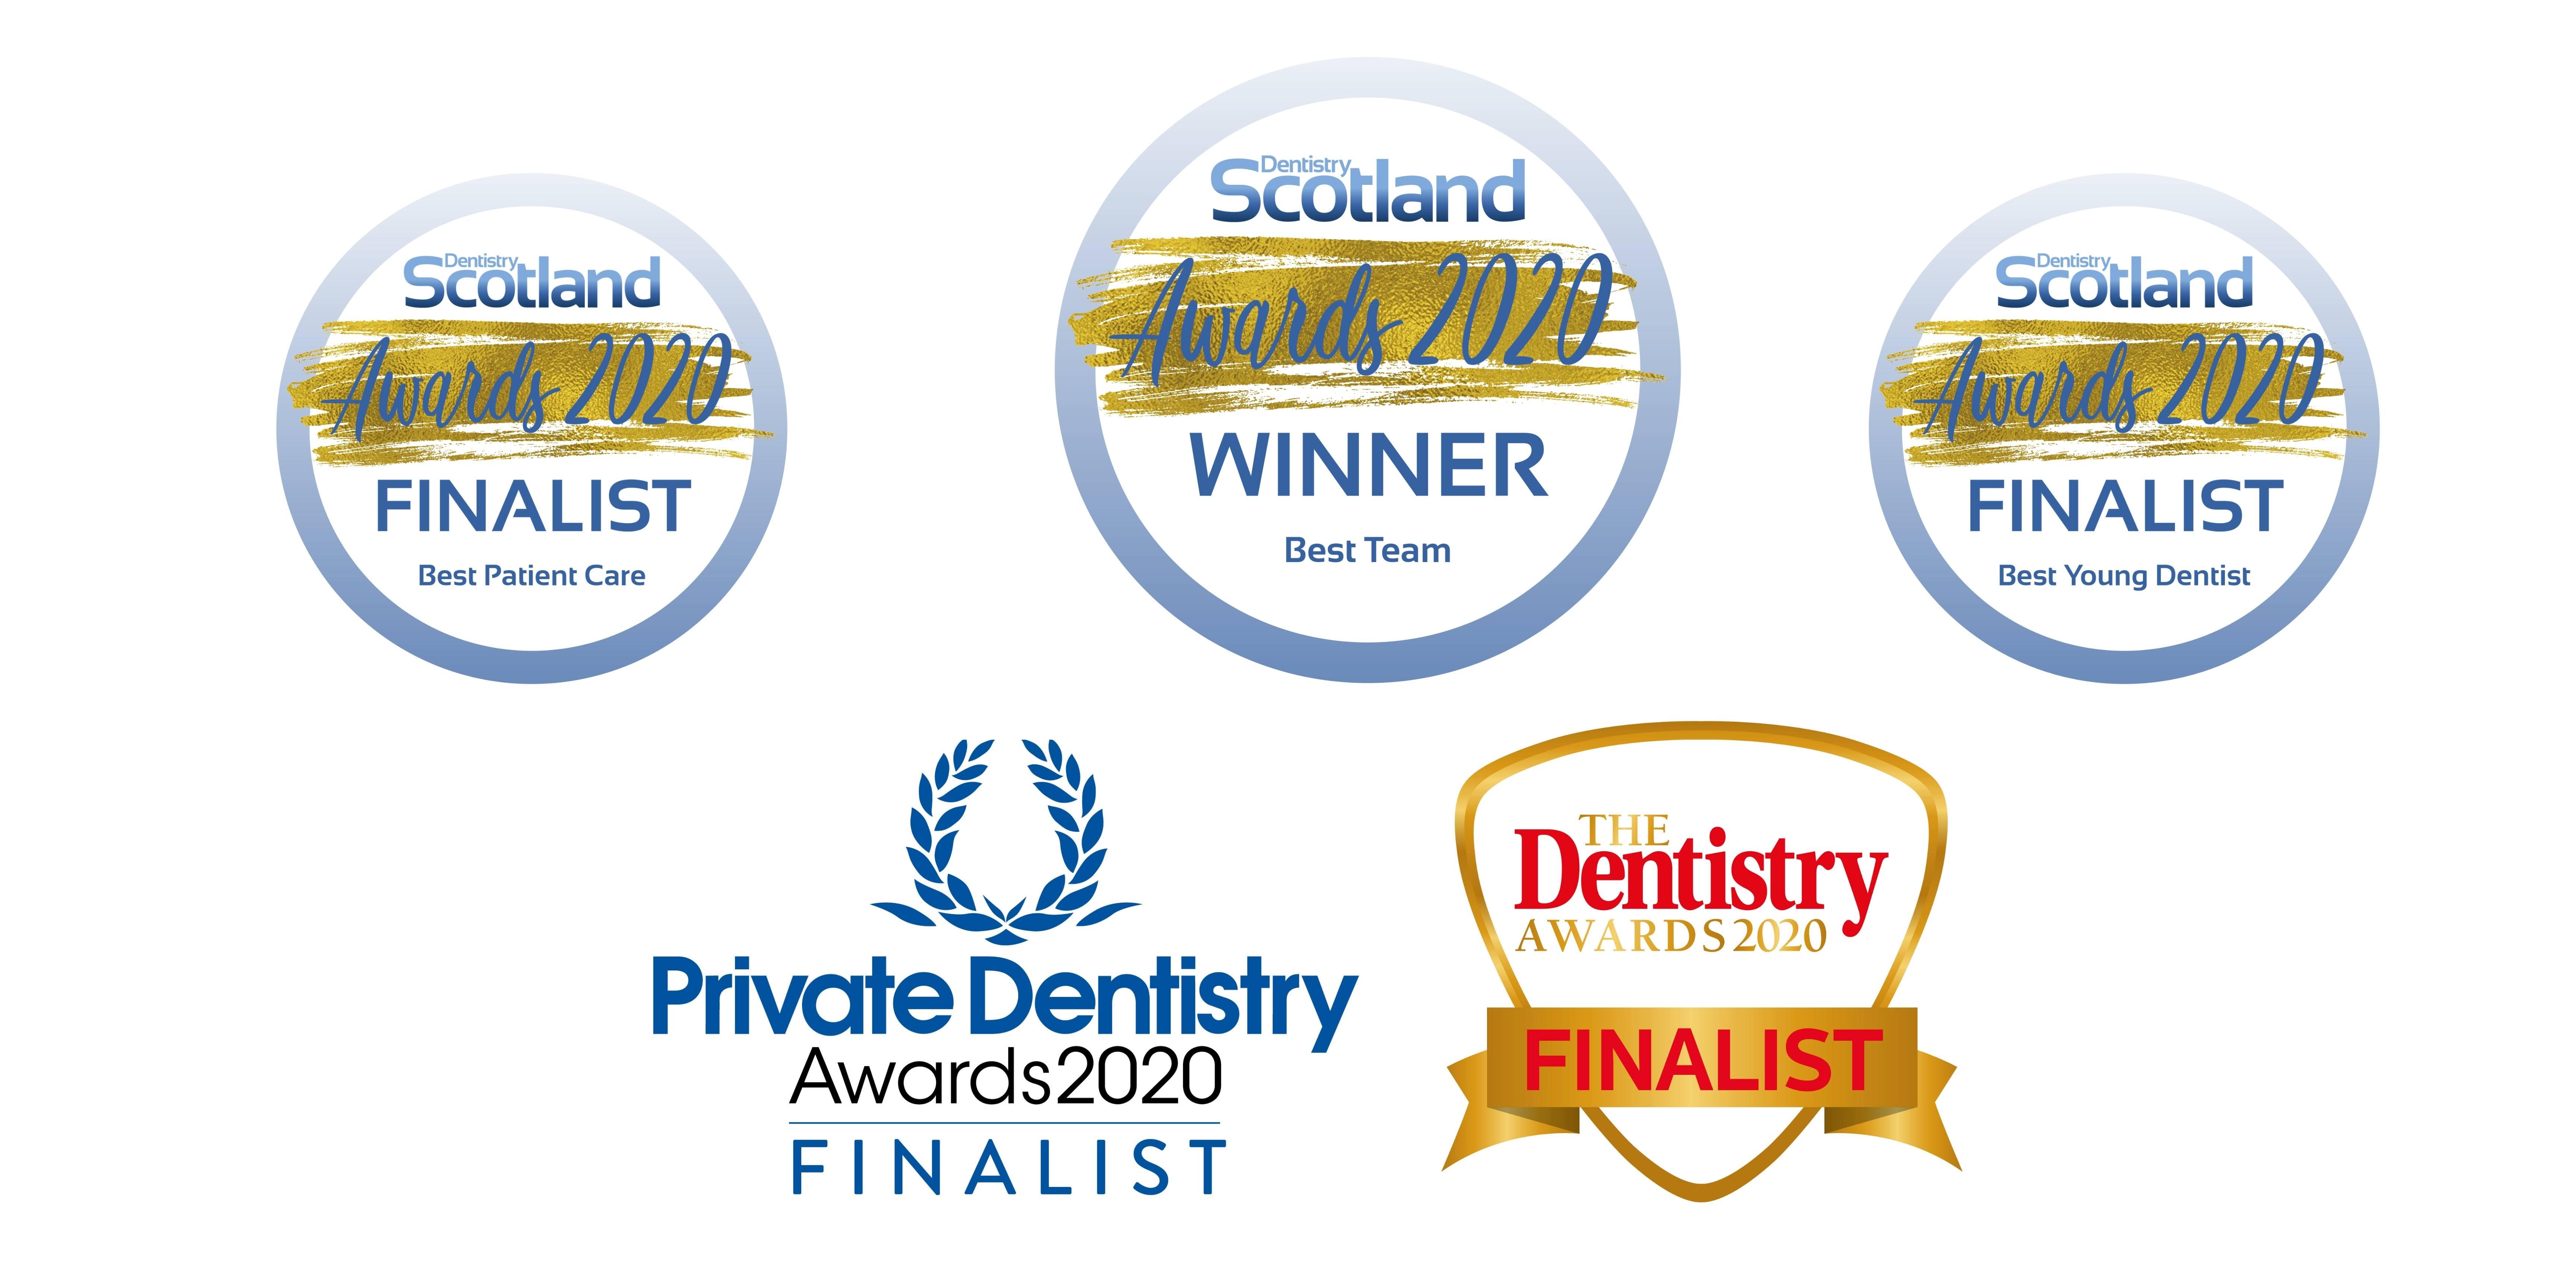 Award winning dentists